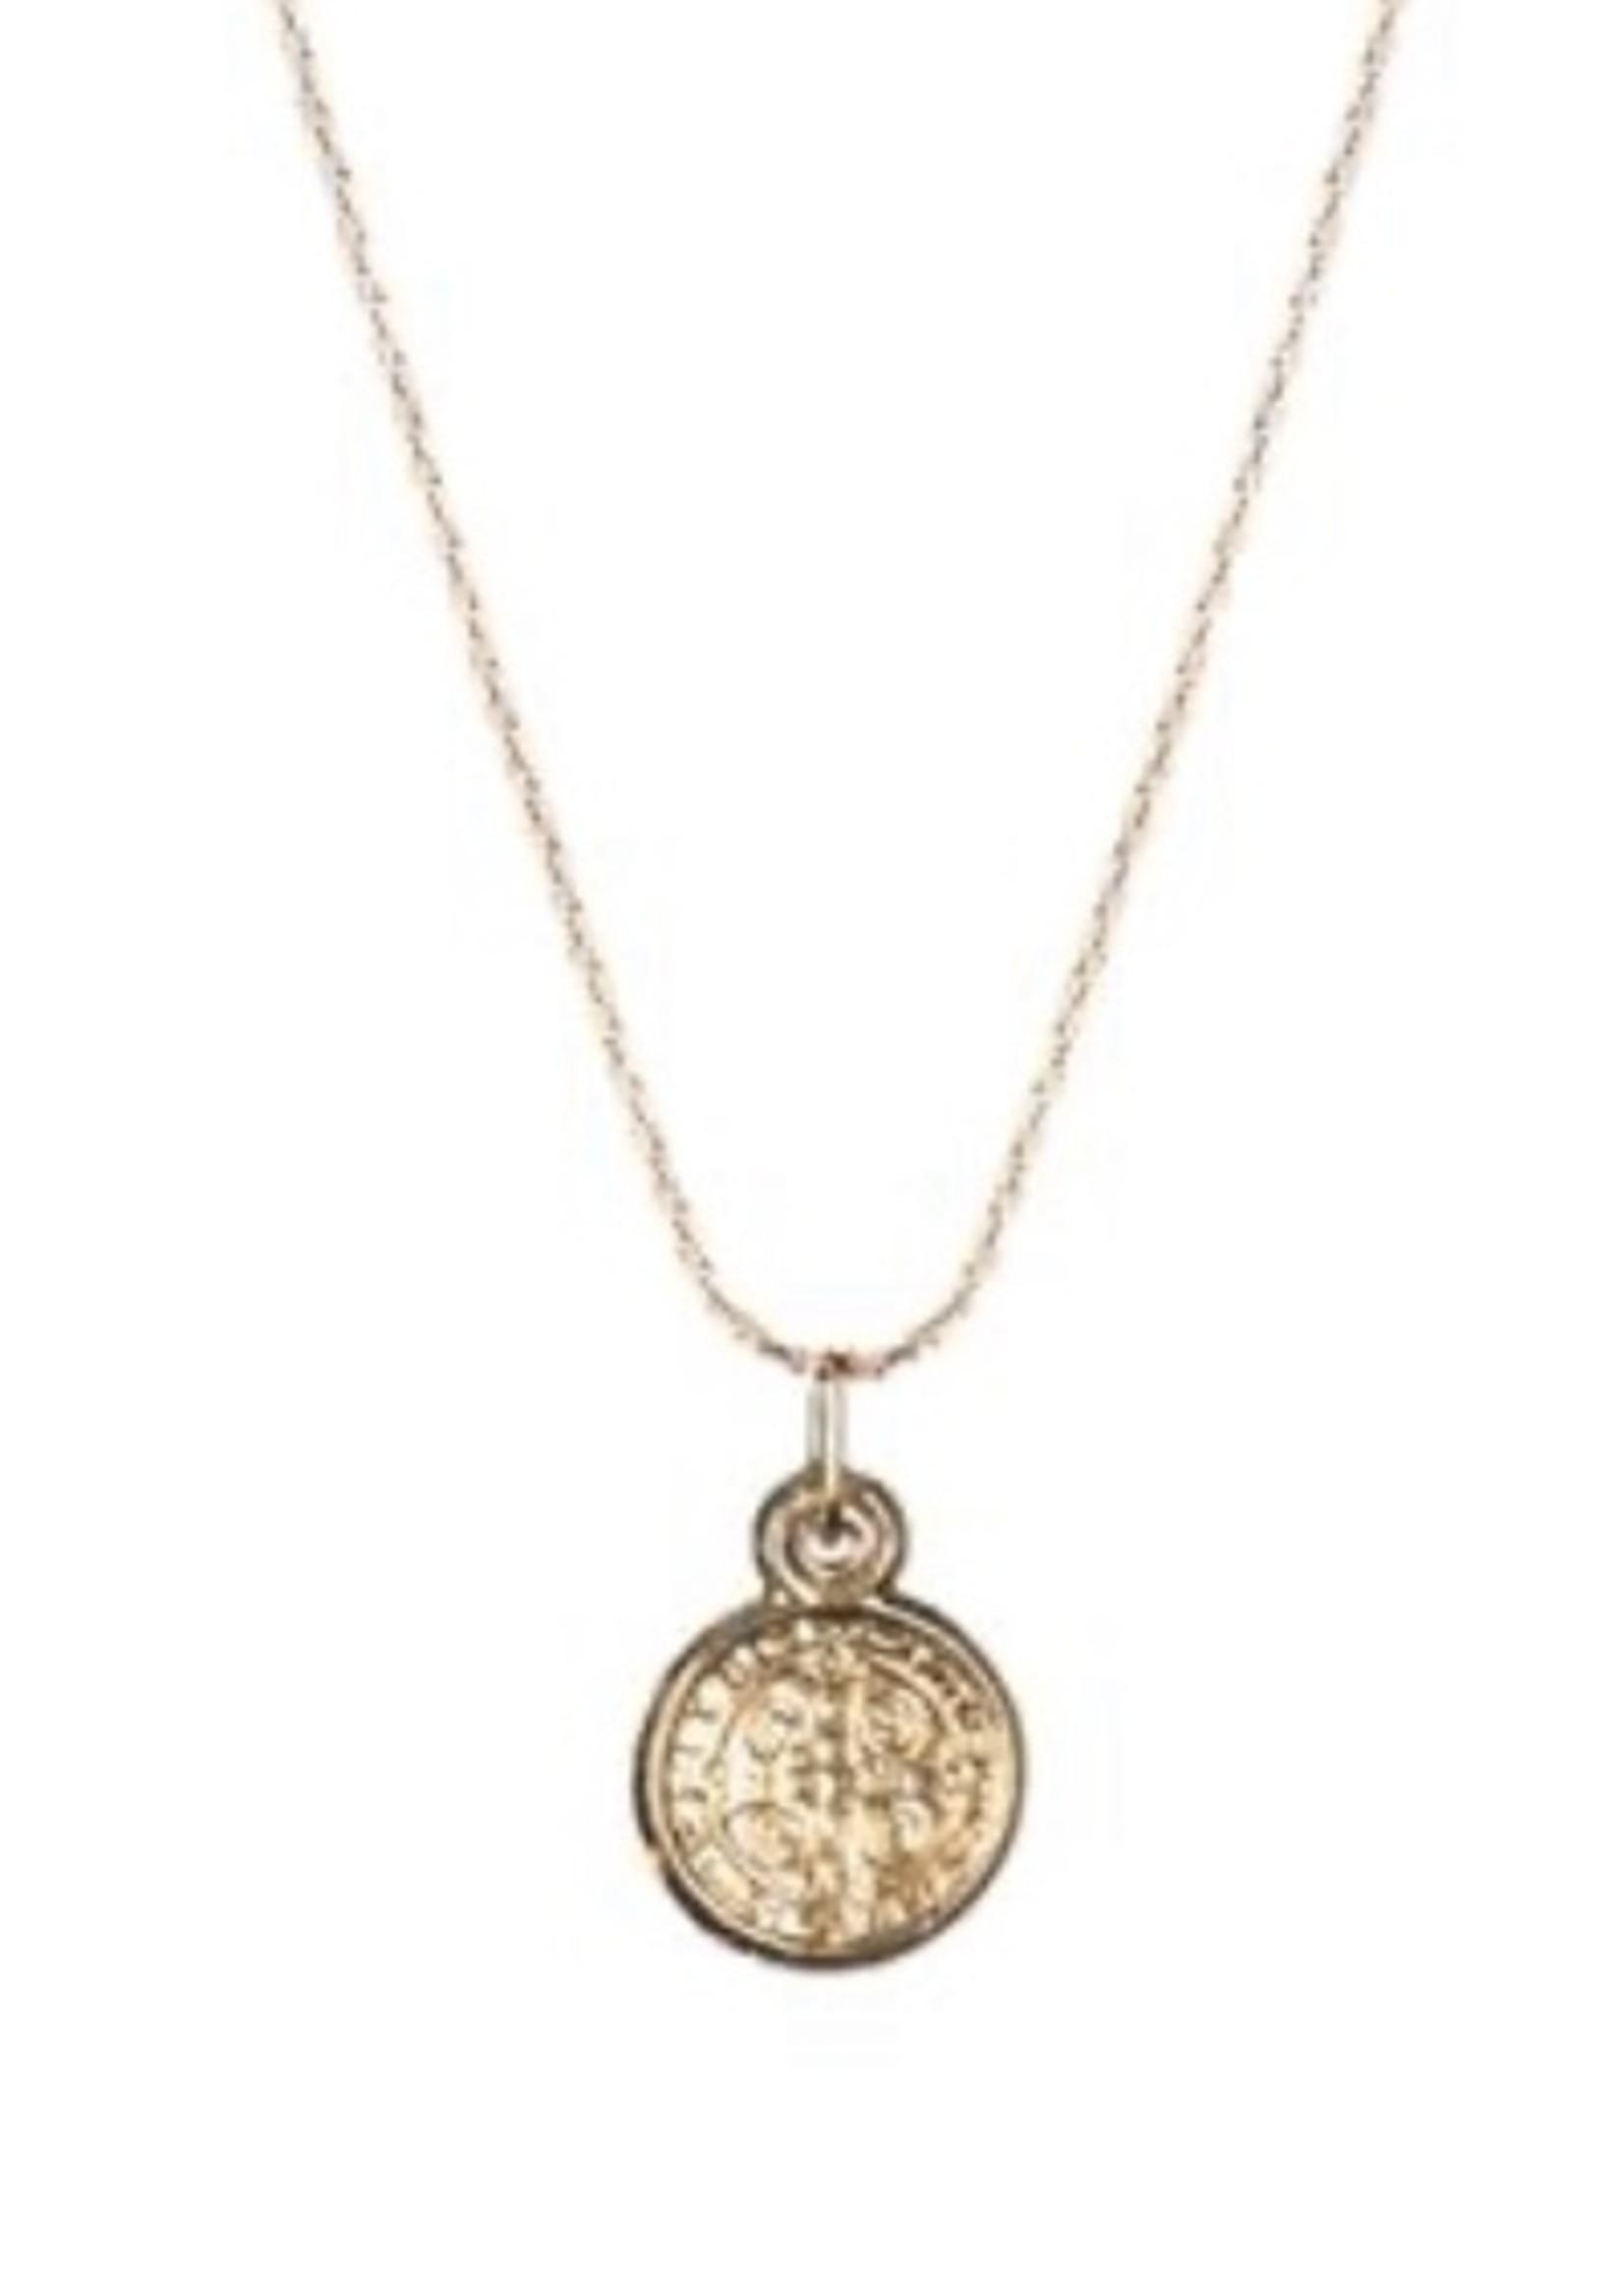 Lisbeth ROMA Necklace 14k gold fill